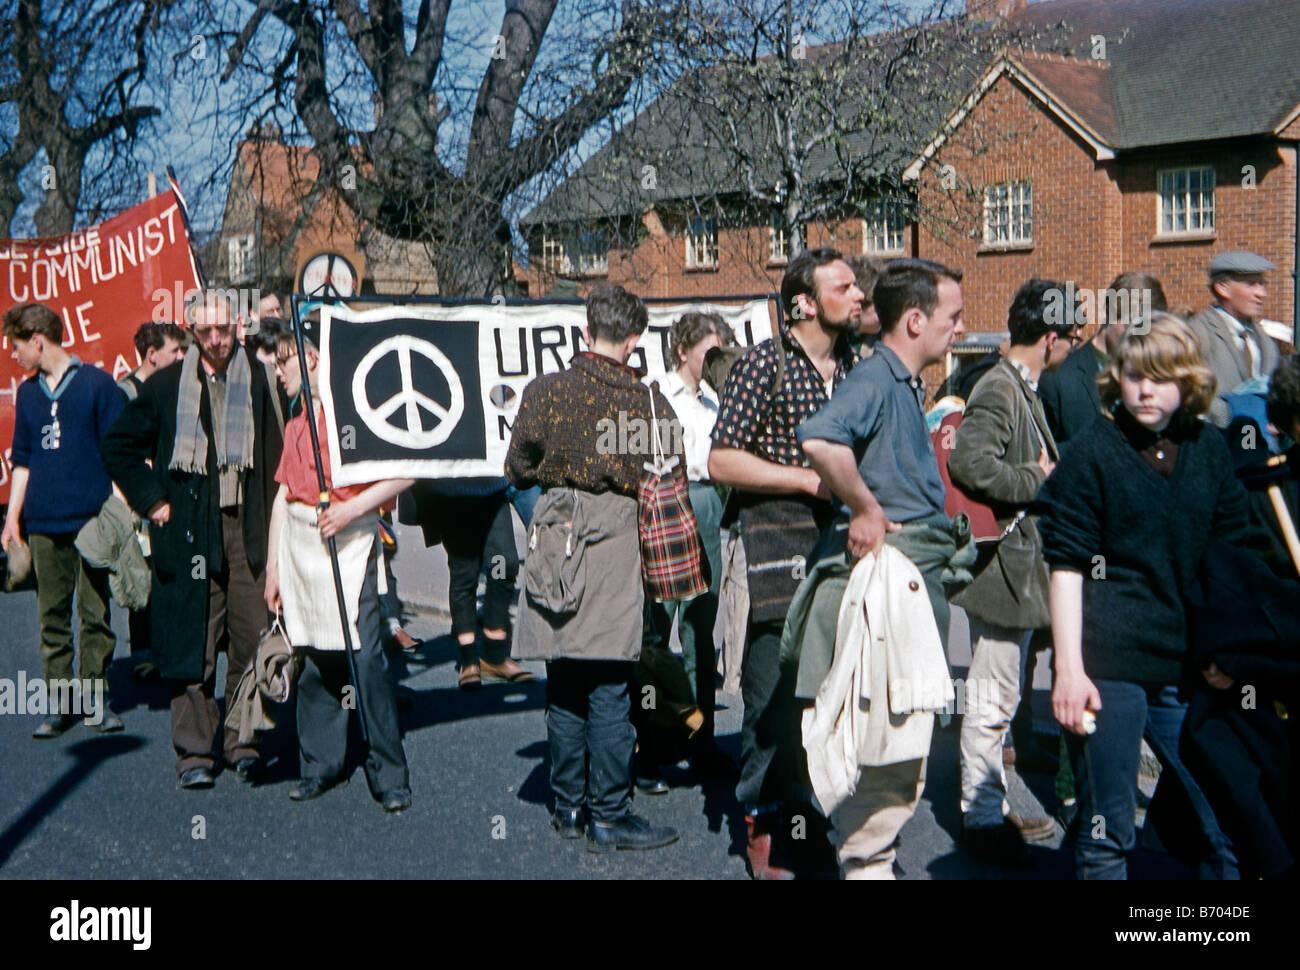 CND (Campaign for Nuclear Disarmament) Aldermaston March, 1962 - Stock Image